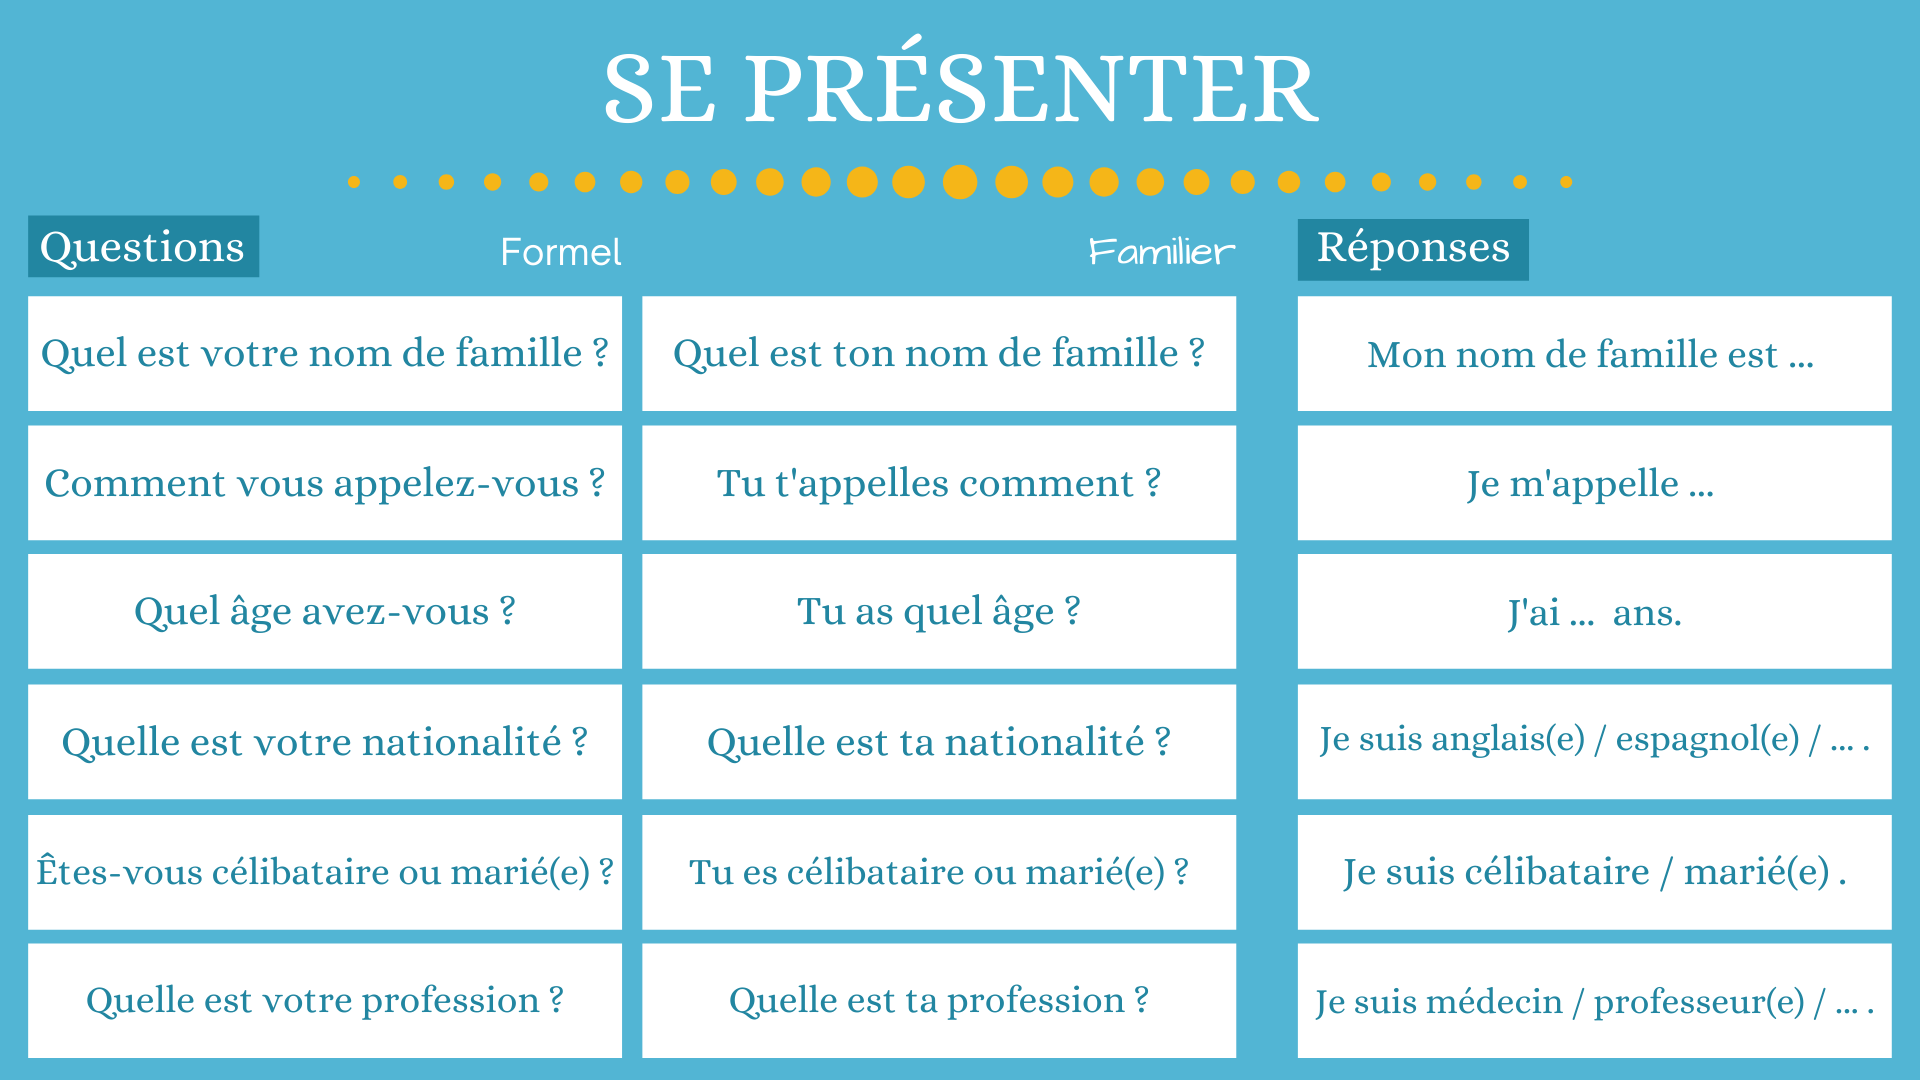 A basic presentation